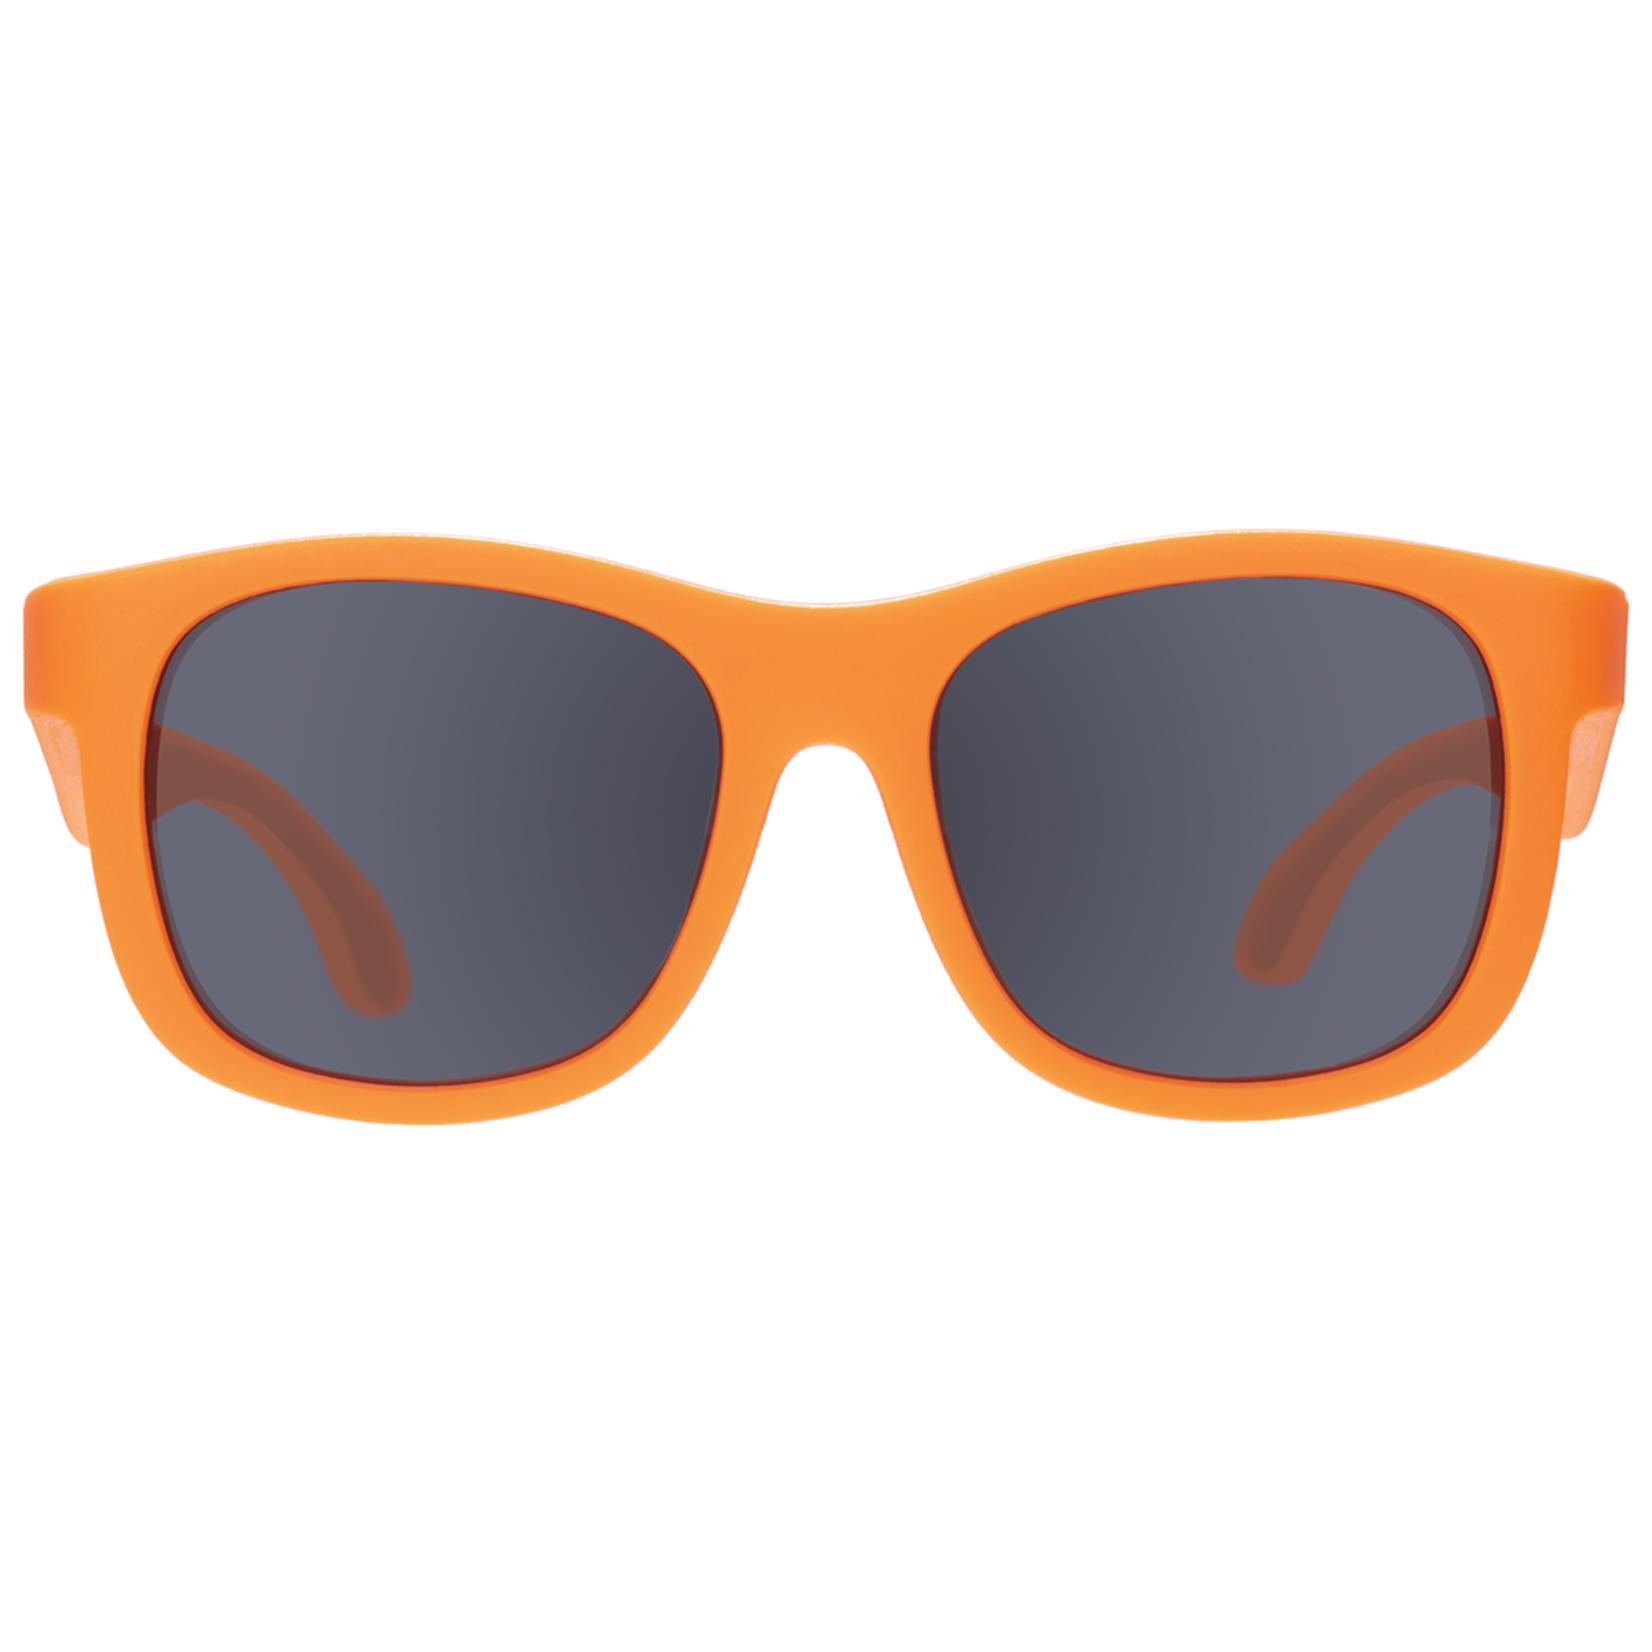 Babiators Sunglasses - Navigator Orange Crush  (Age 0-2Y)